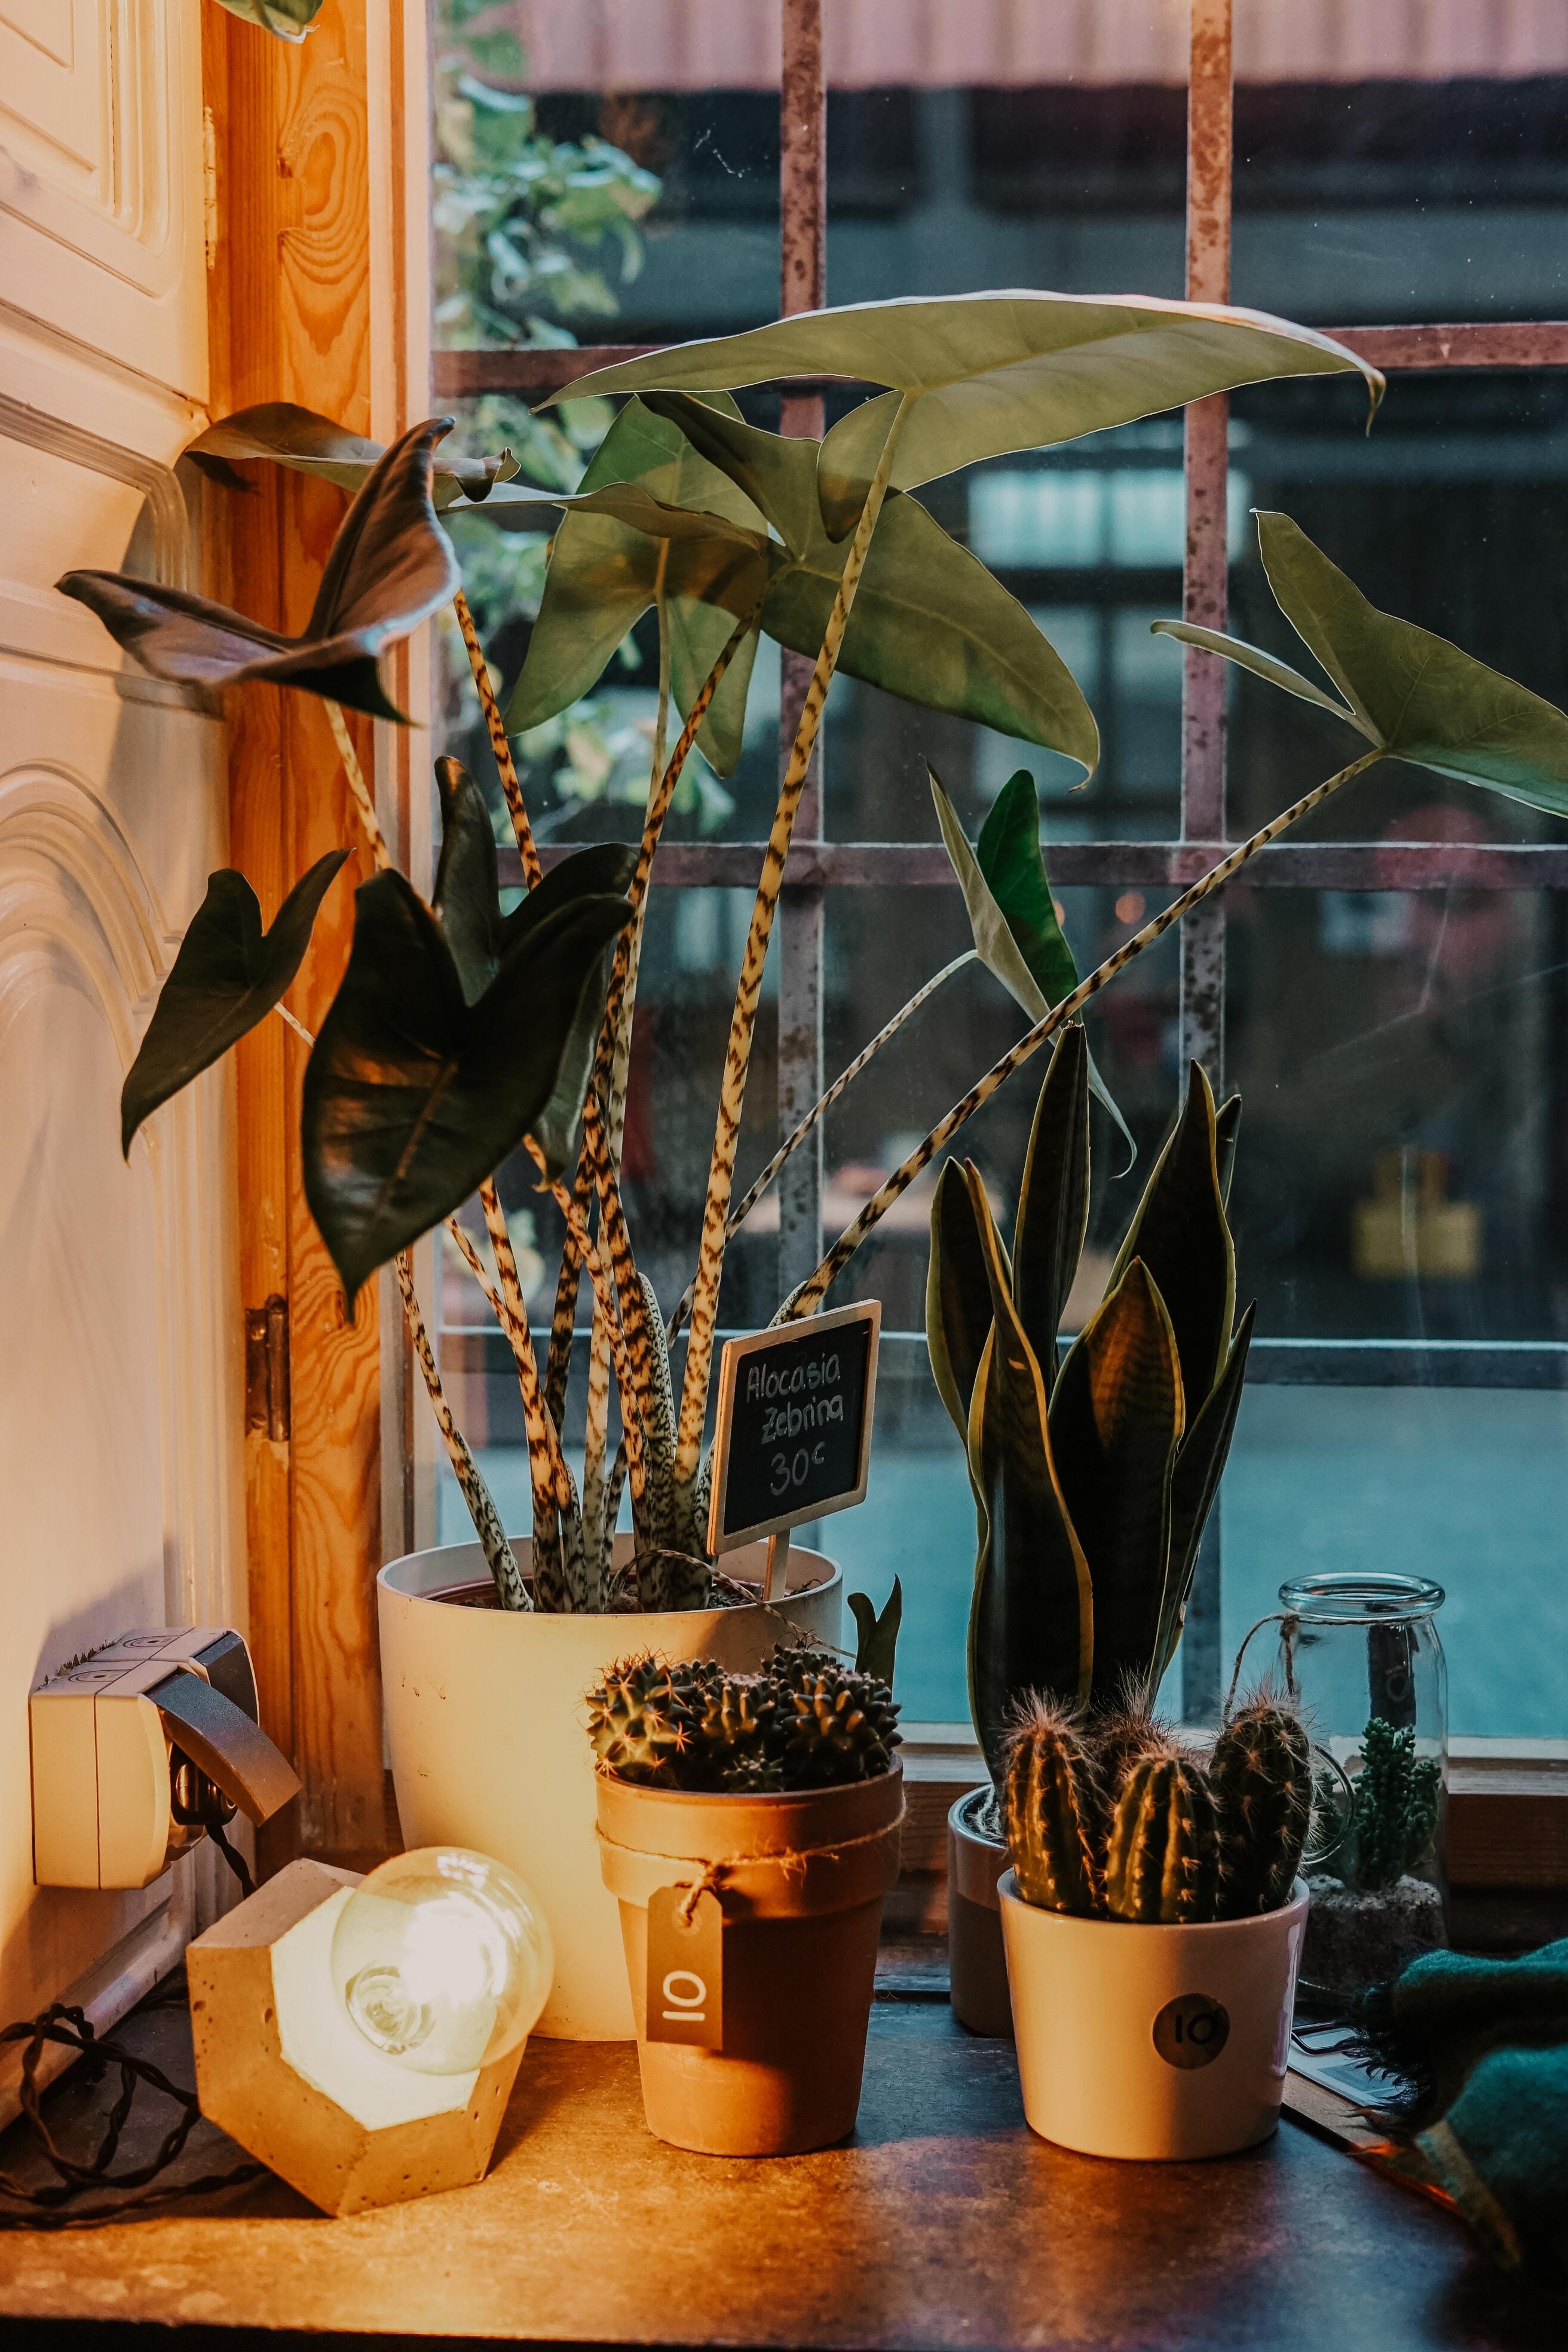 cactus and indoor plant near windowpane